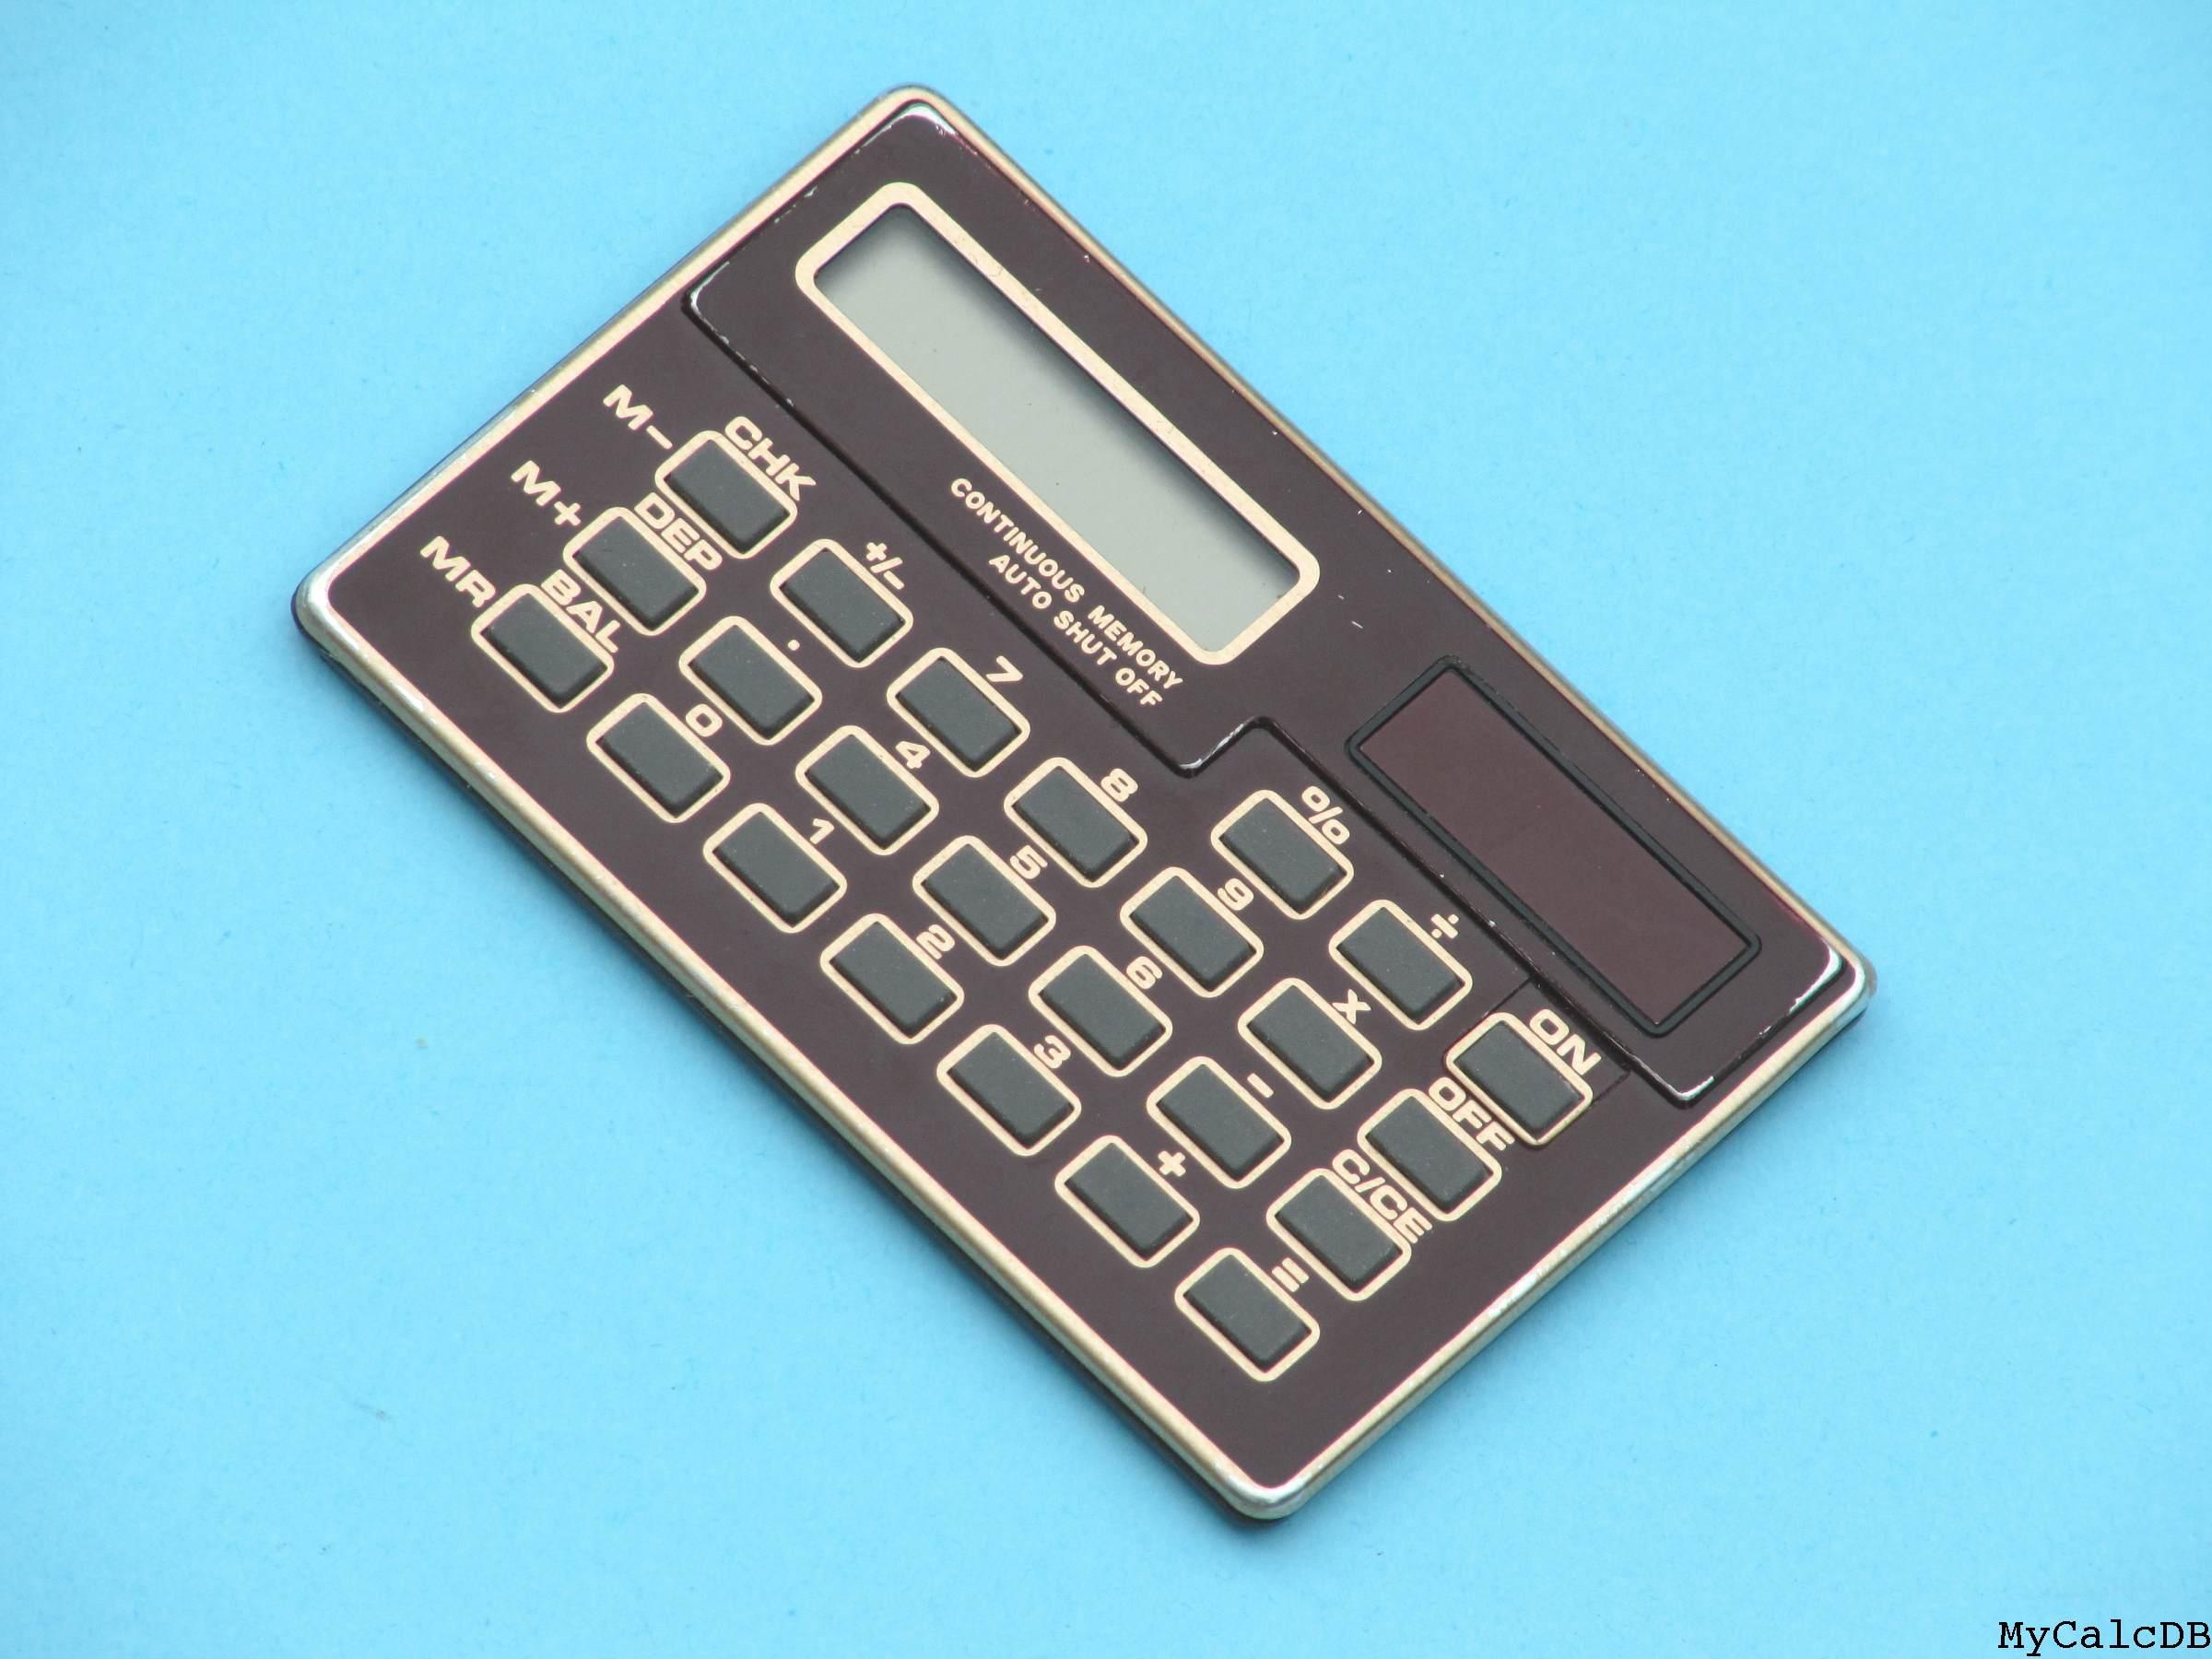 mycalcdb calculator no brand name no model name. Black Bedroom Furniture Sets. Home Design Ideas